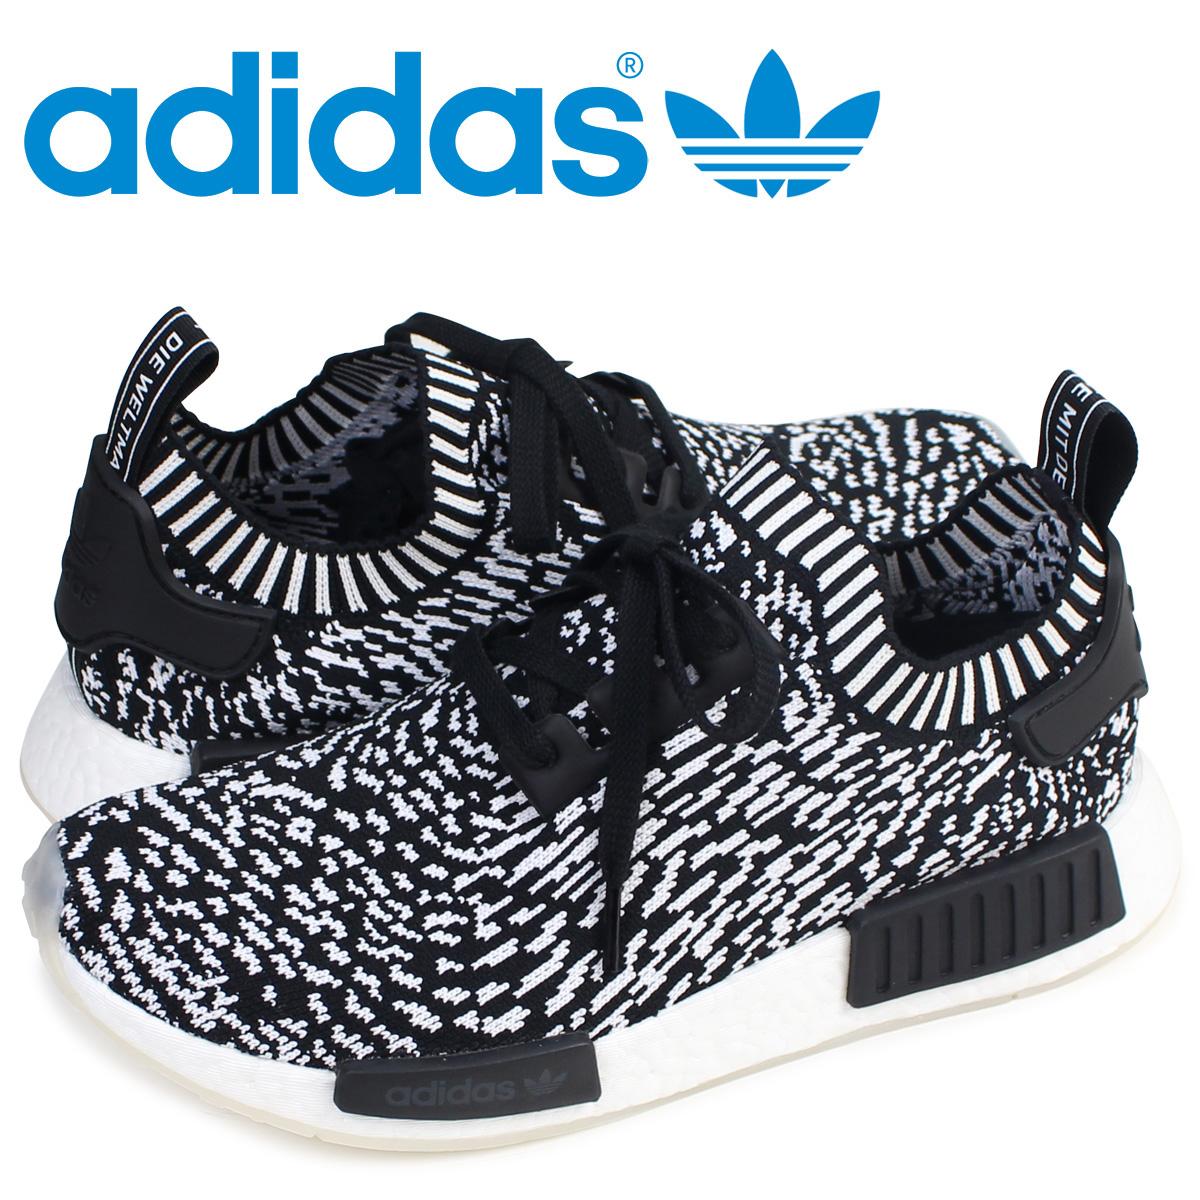 cheaper 7f0eb c340e adidas Originals NMD R1 PK Adidas originals sneakers N M D nomad men BY3013  ZEBRA PACK shoes black [179]